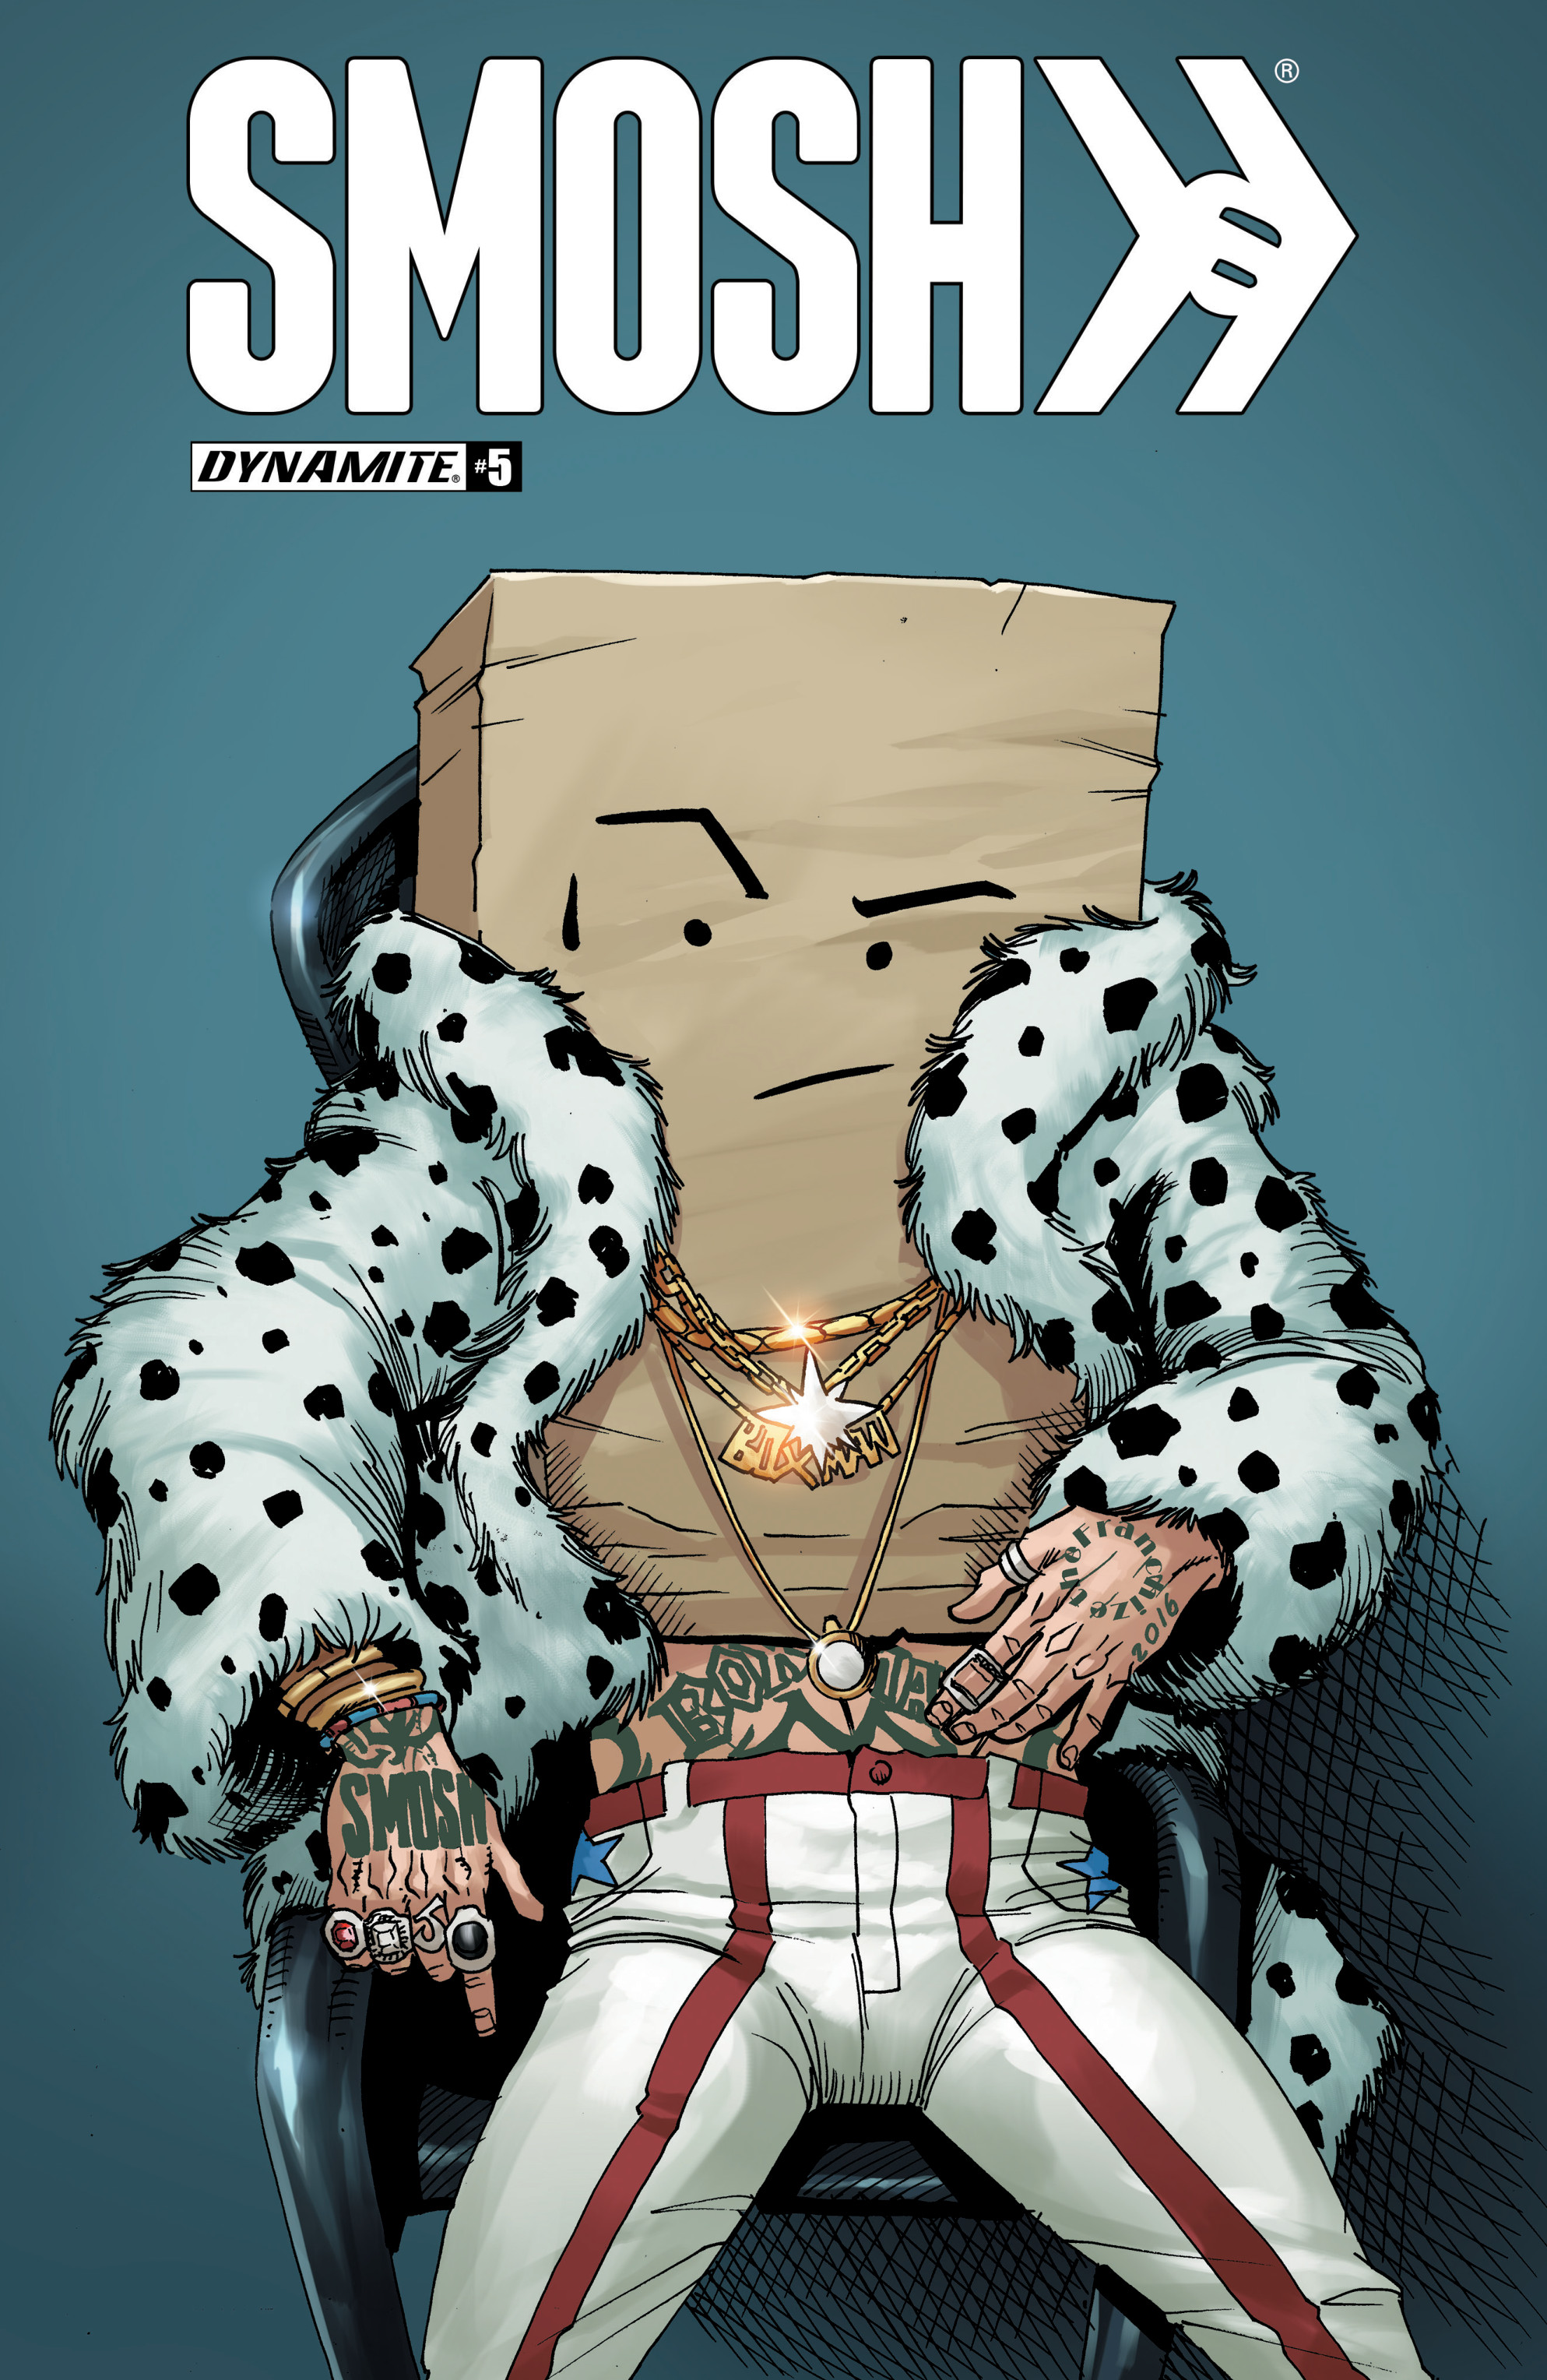 Read online Smosh comic -  Issue #5 - 1